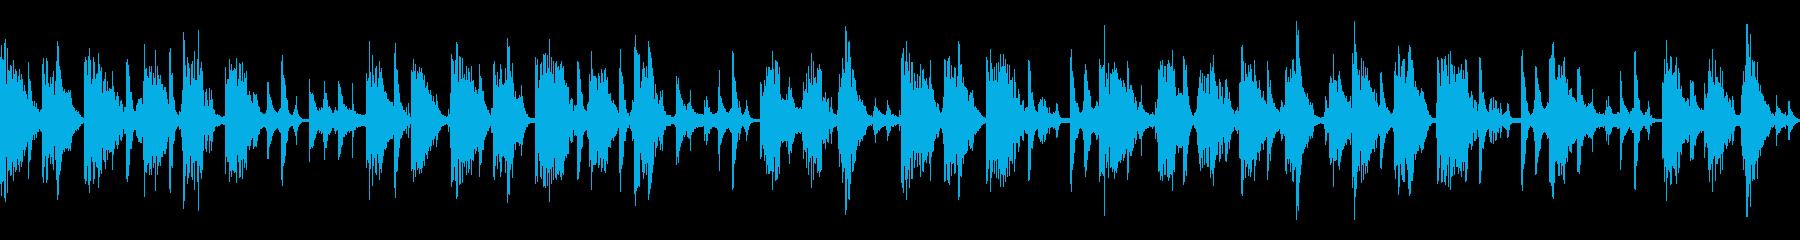 Jazzyなループ仕様楽曲の再生済みの波形